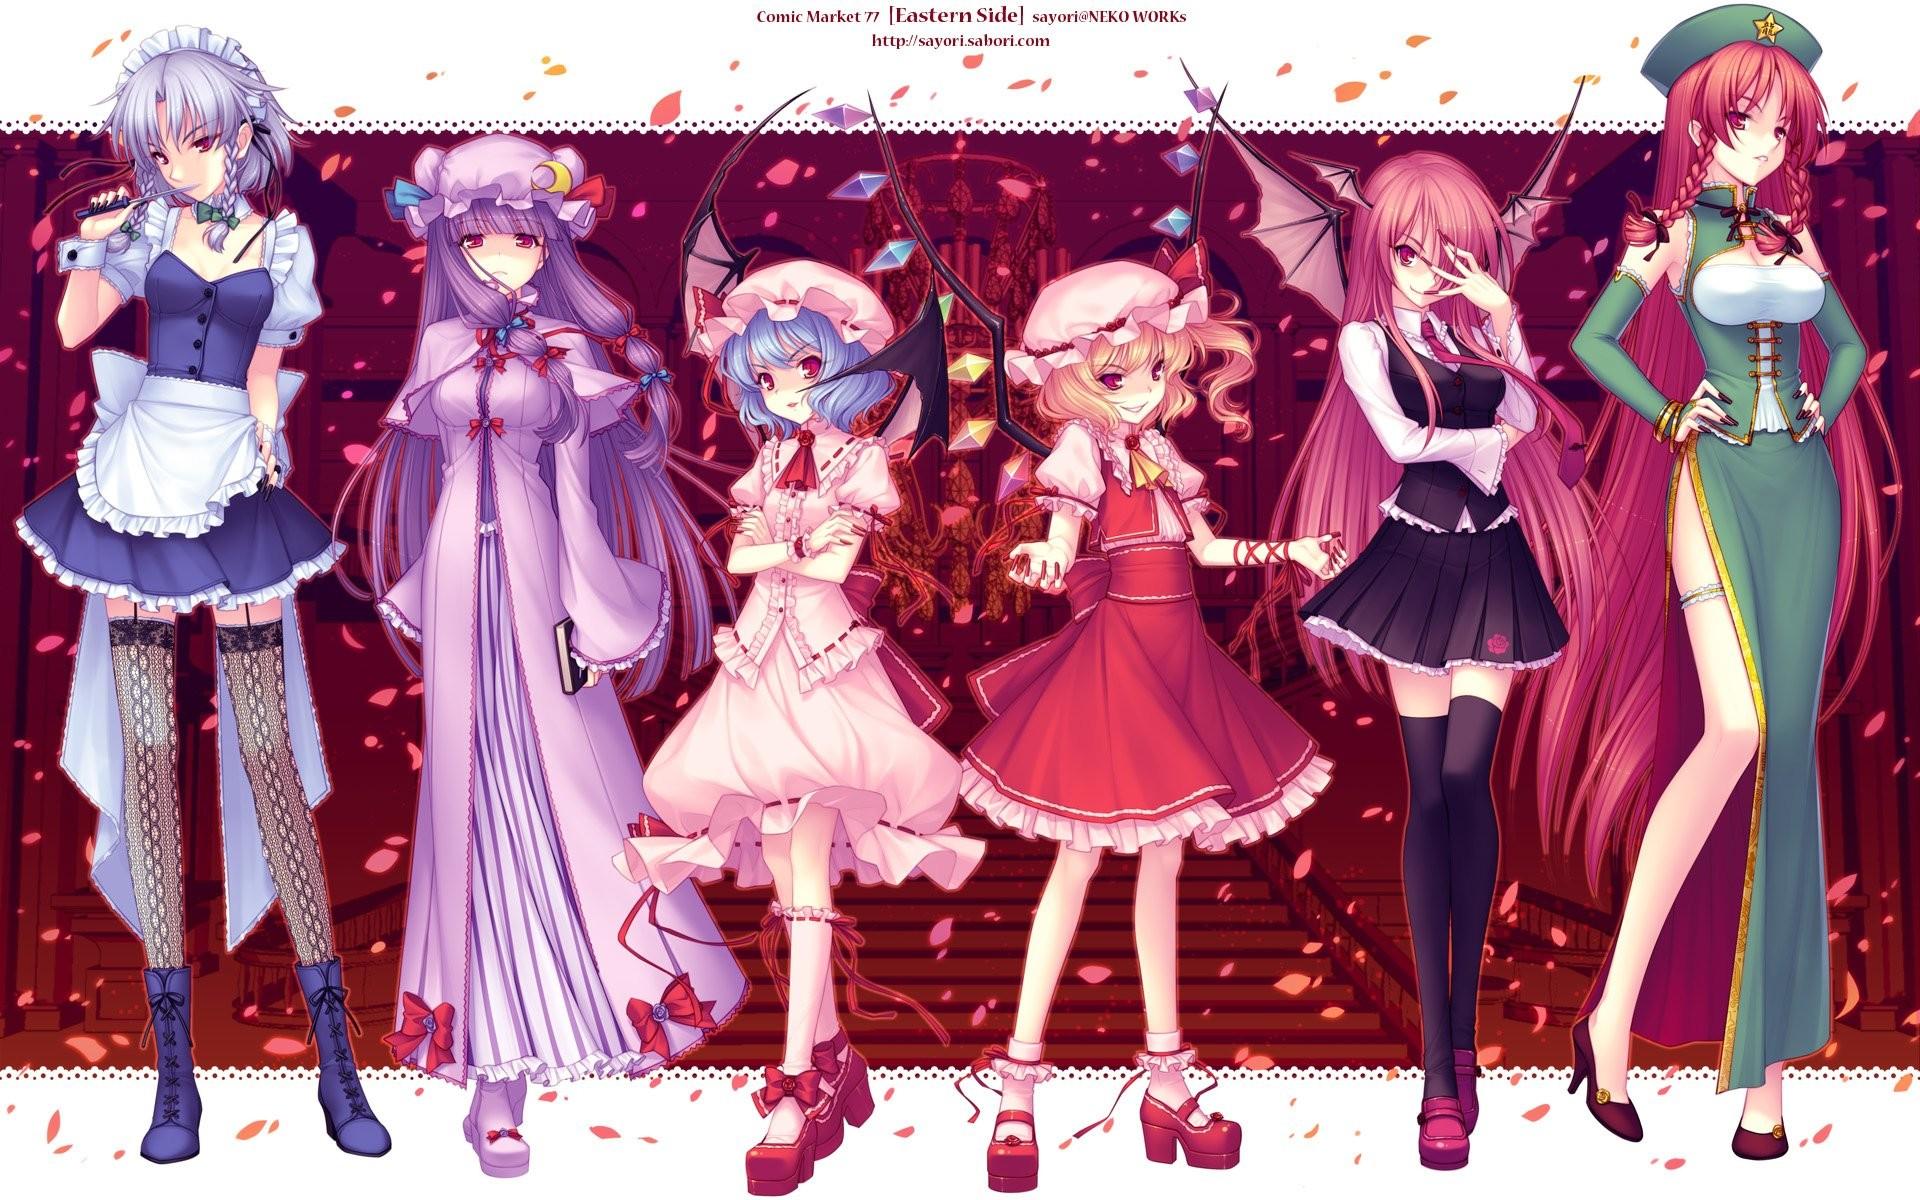 HD Wallpaper   Background ID:84842. Anime Touhou